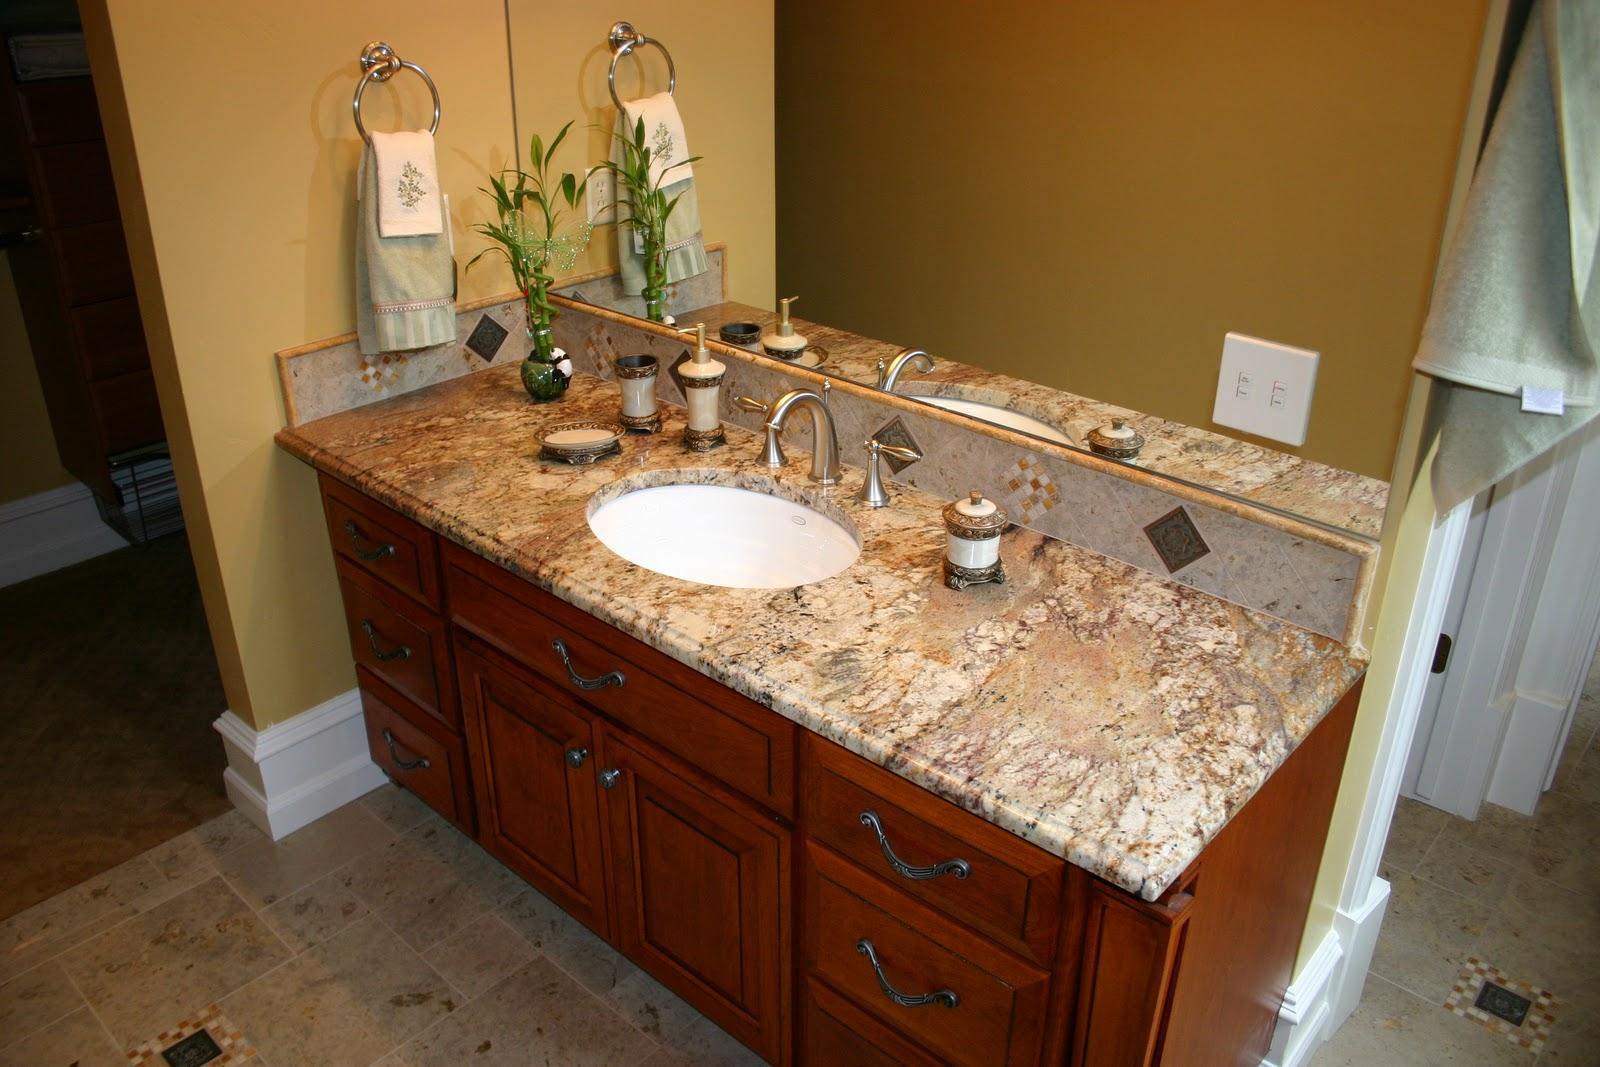 The granite gurus typhoon bordeaux granite bath from mgs by design for Granite bathroom